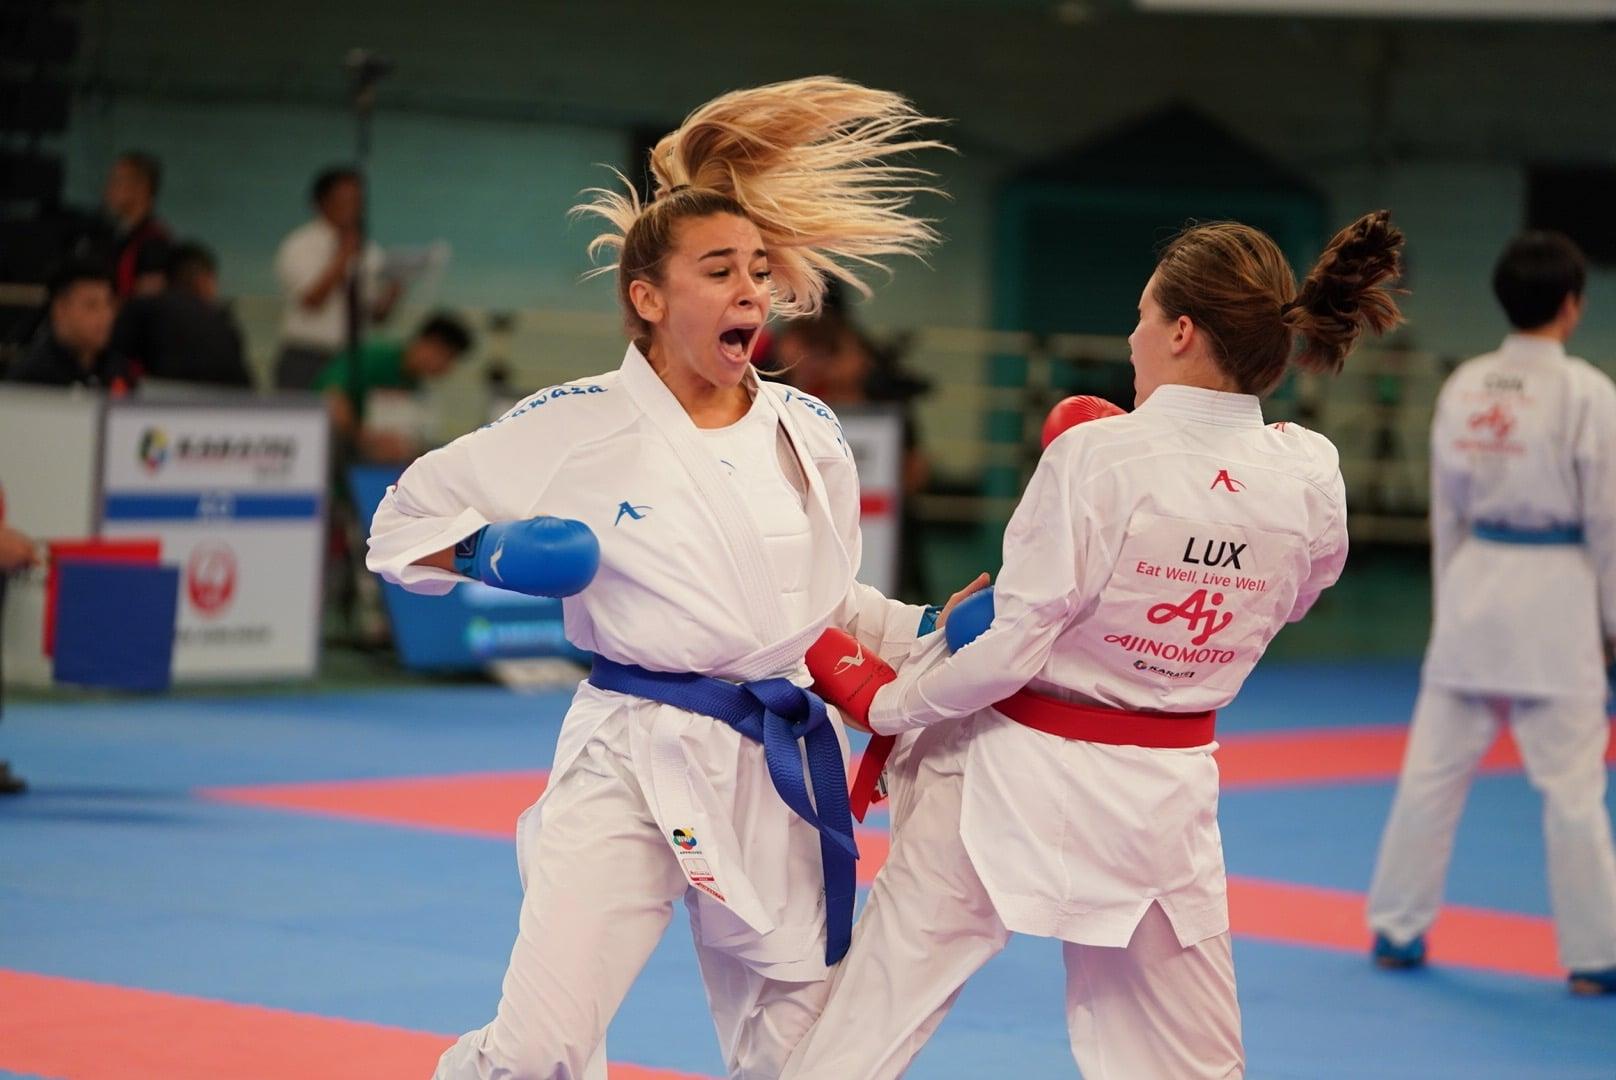 Каратистка Анжелика Терлюга принесла серебряную медаль Украине на Олимпиаде в Токио - фото №1